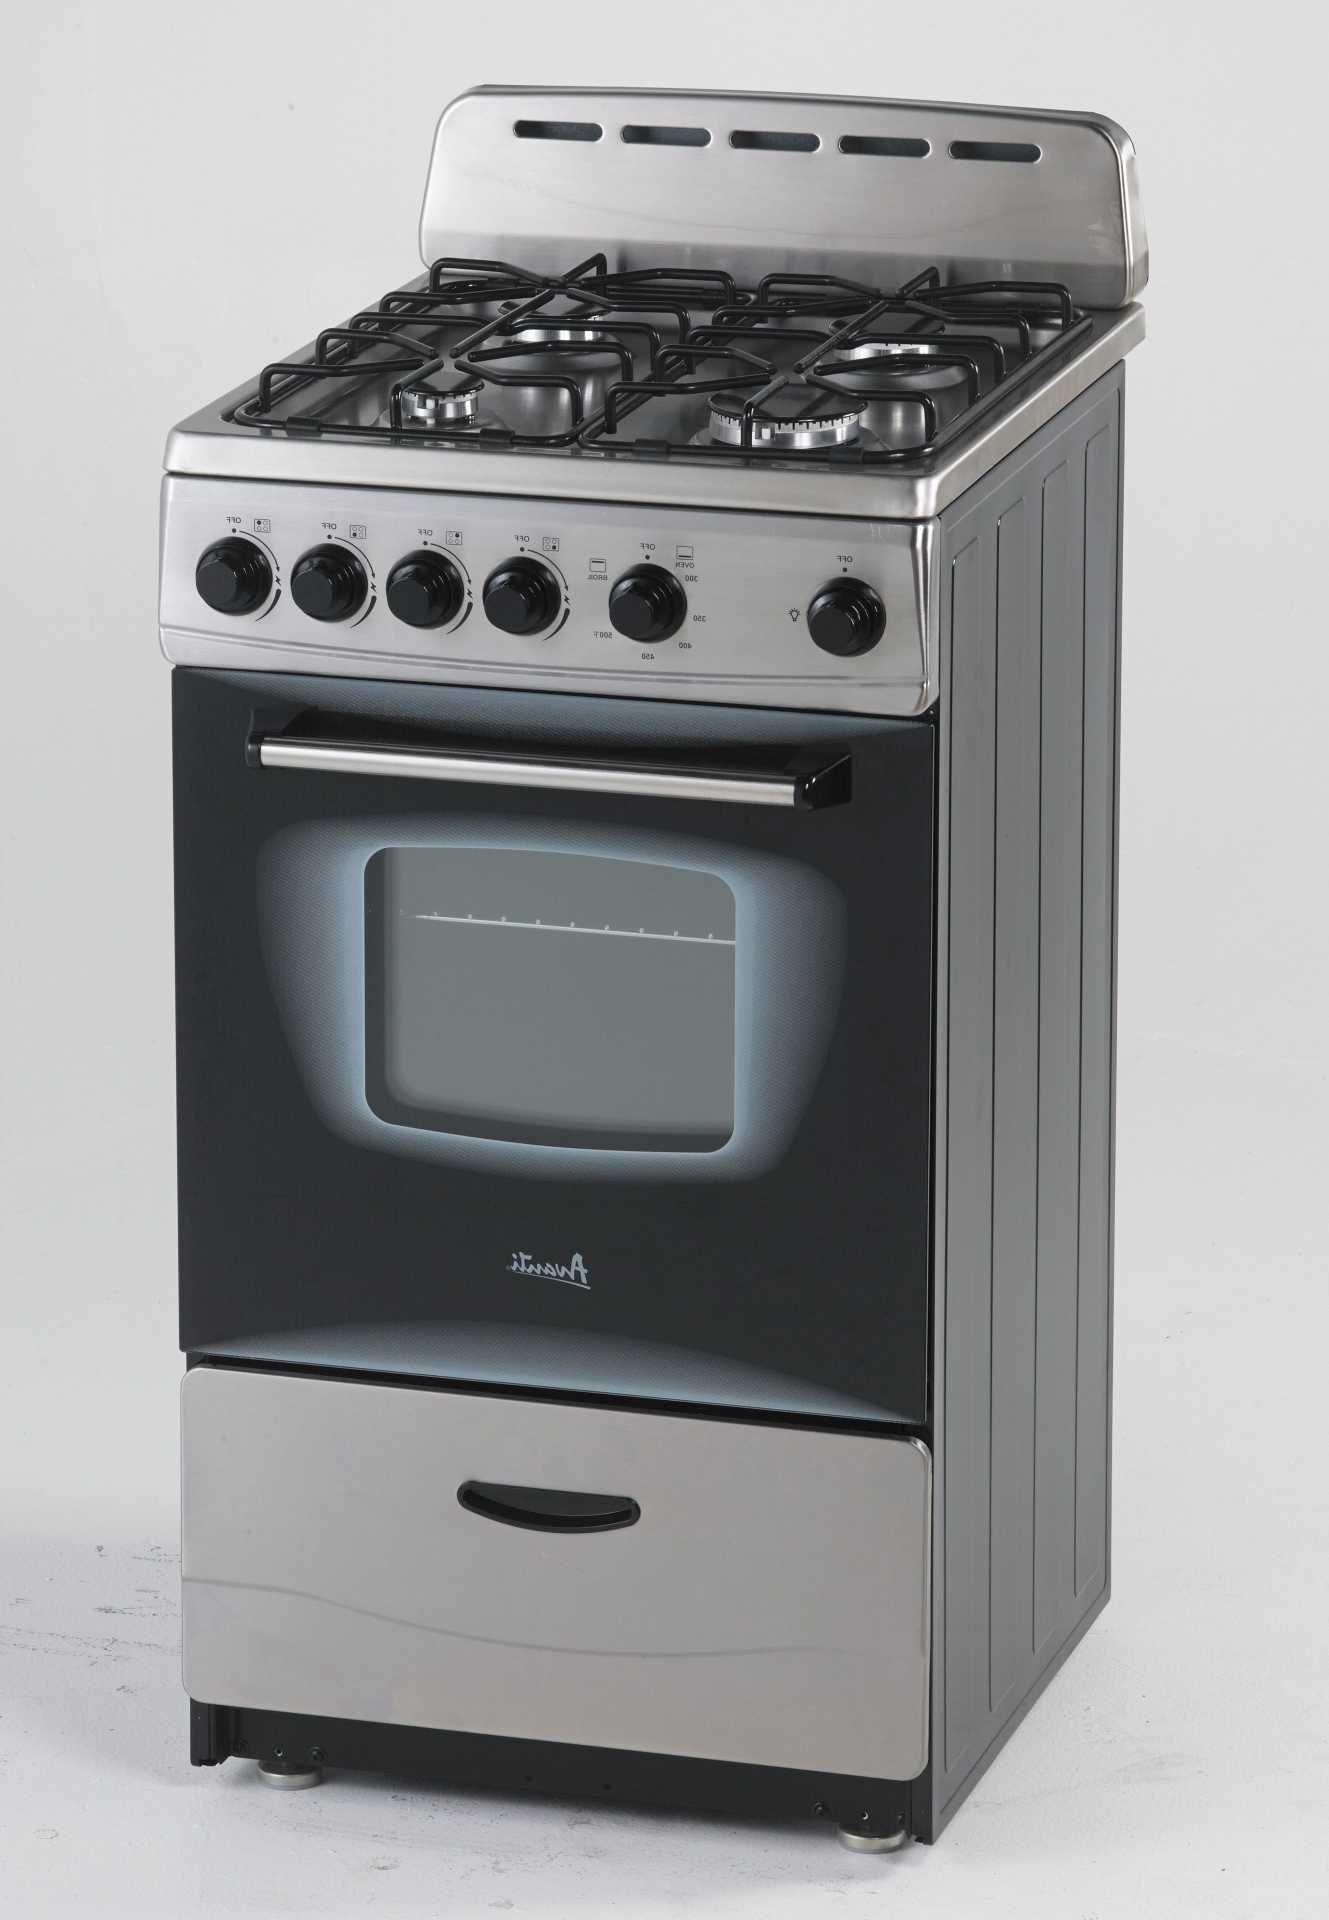 Avanti Gr20x 20 Inch Freestanding Gas Range With 4 Sealed Burners